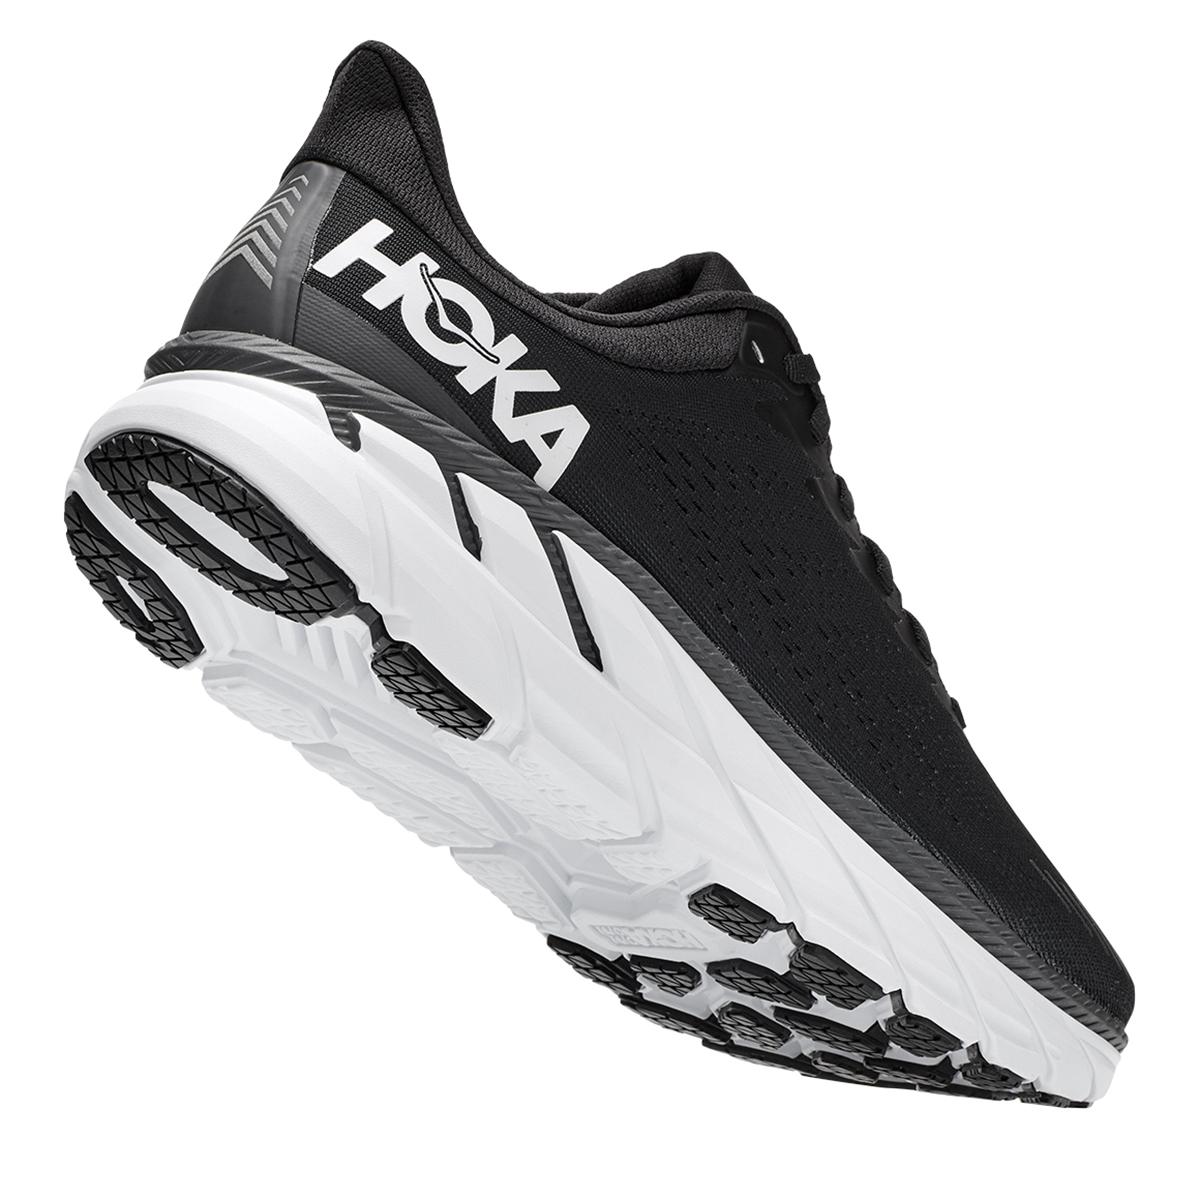 Men's Hoka One One Clifton 7 Running Shoe - Color: Black/White - Size: 7 - Width: Regular, Black/White, large, image 5